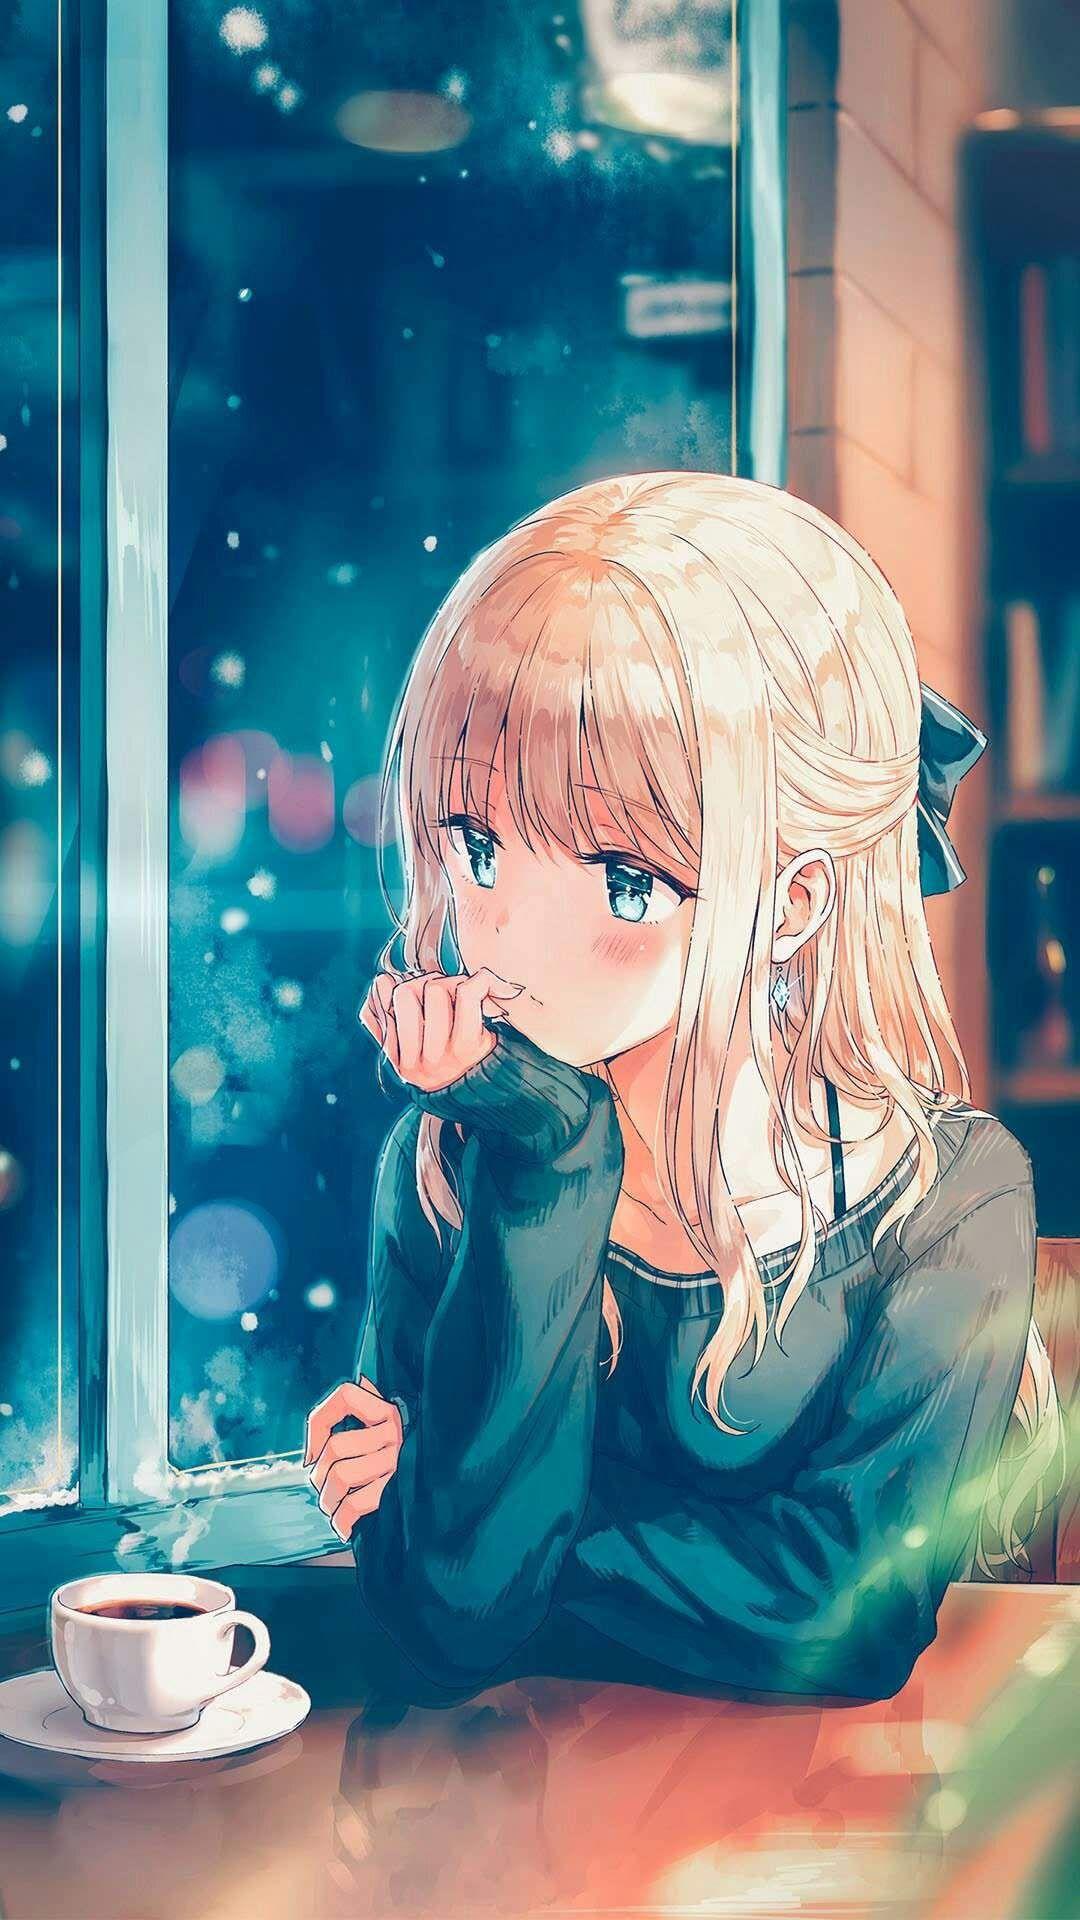 Sad Anime Wallpaper For Mobile Anime Girl Drinking Coffee 1080x1920 Download Hd Wallpaper Wallpapertip